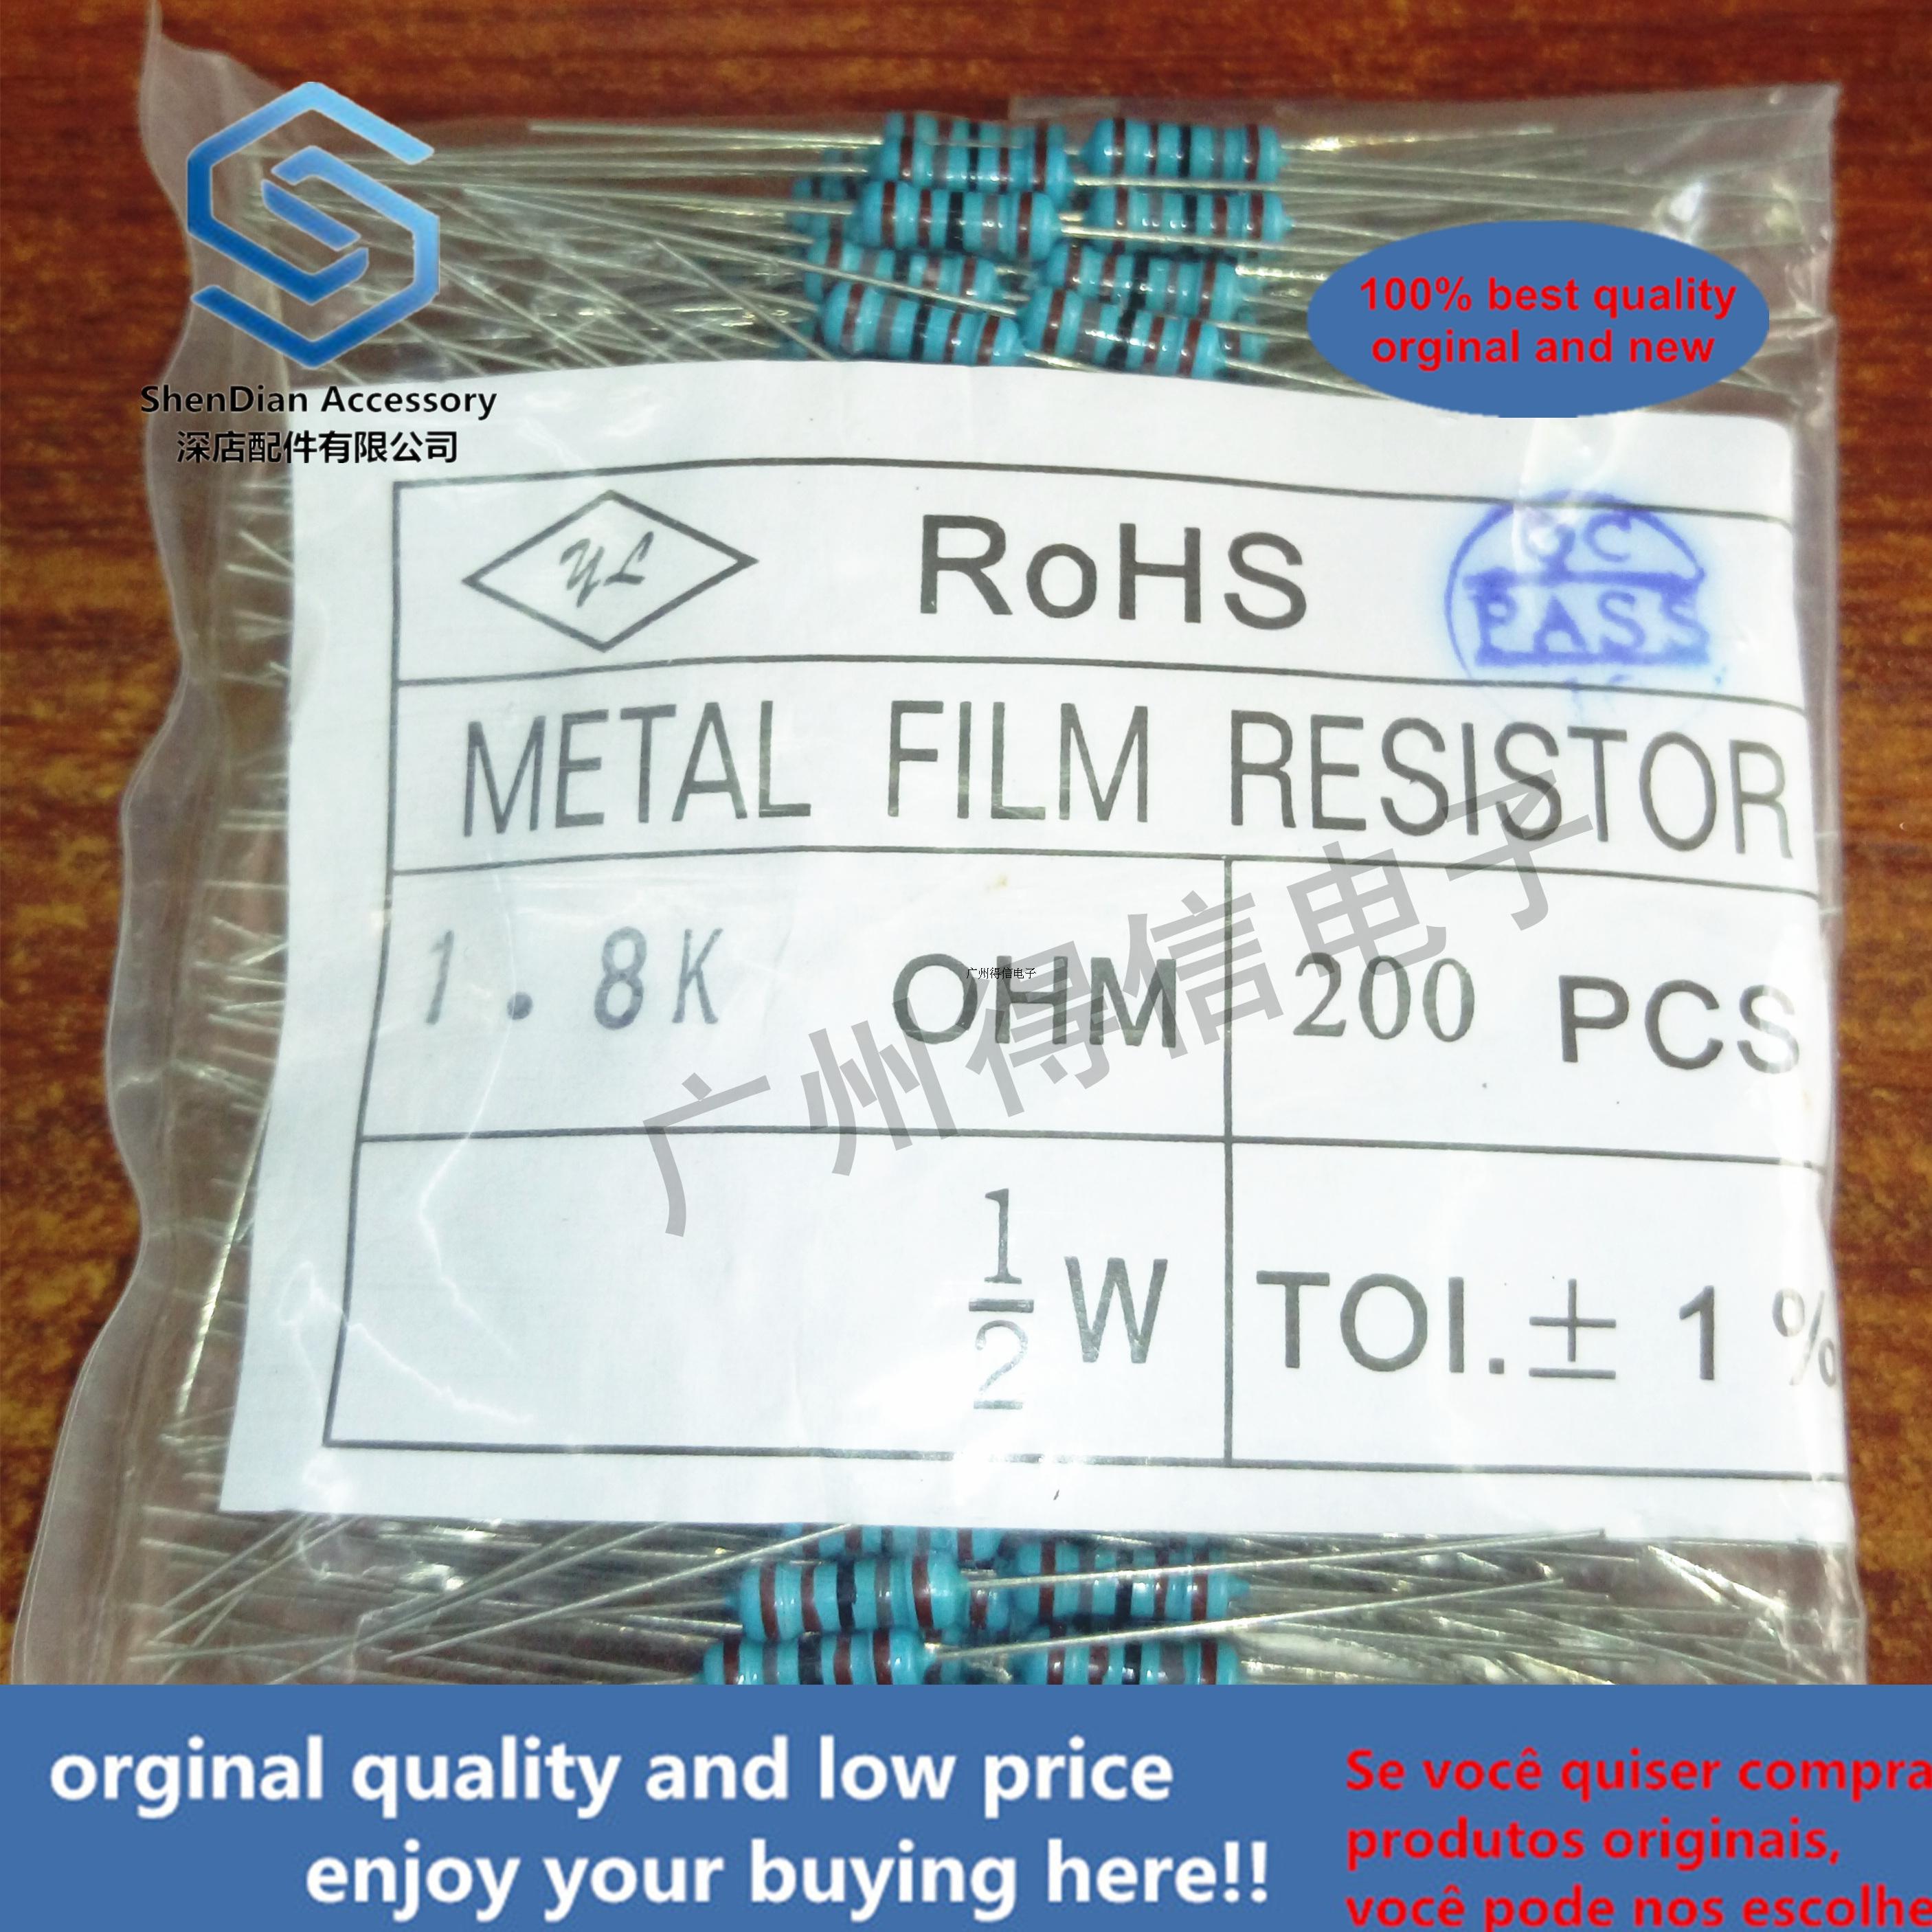 200pcs 1 / 2W 2.2R 2.2 Euro 1% Brand New Metal Film Iron Feet Resistance Bag 200 Pcs Per Pack